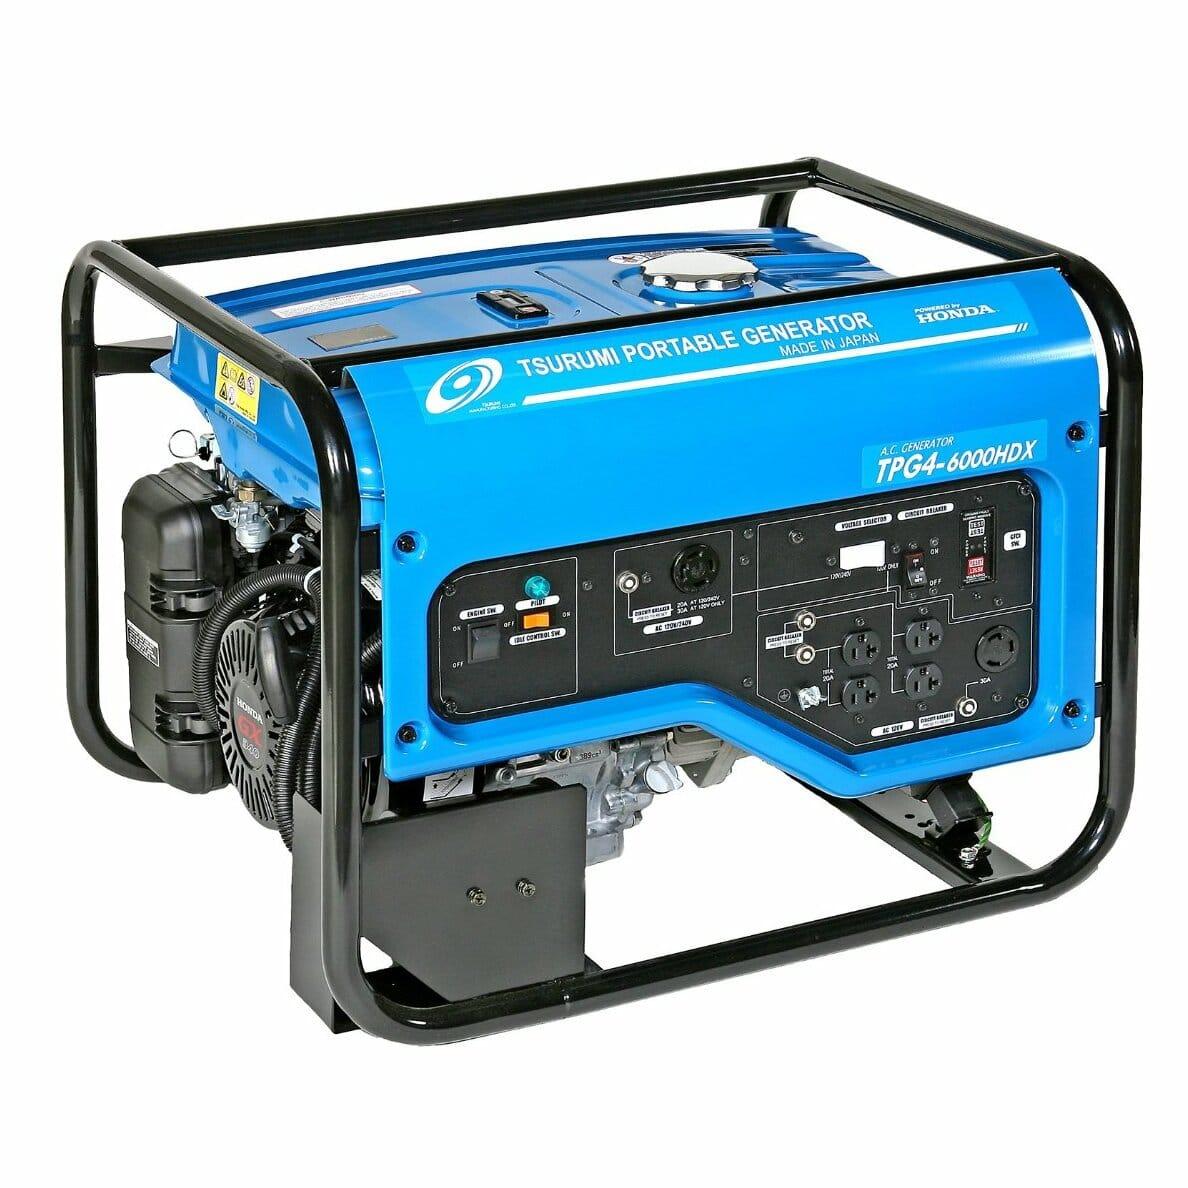 6000w generator